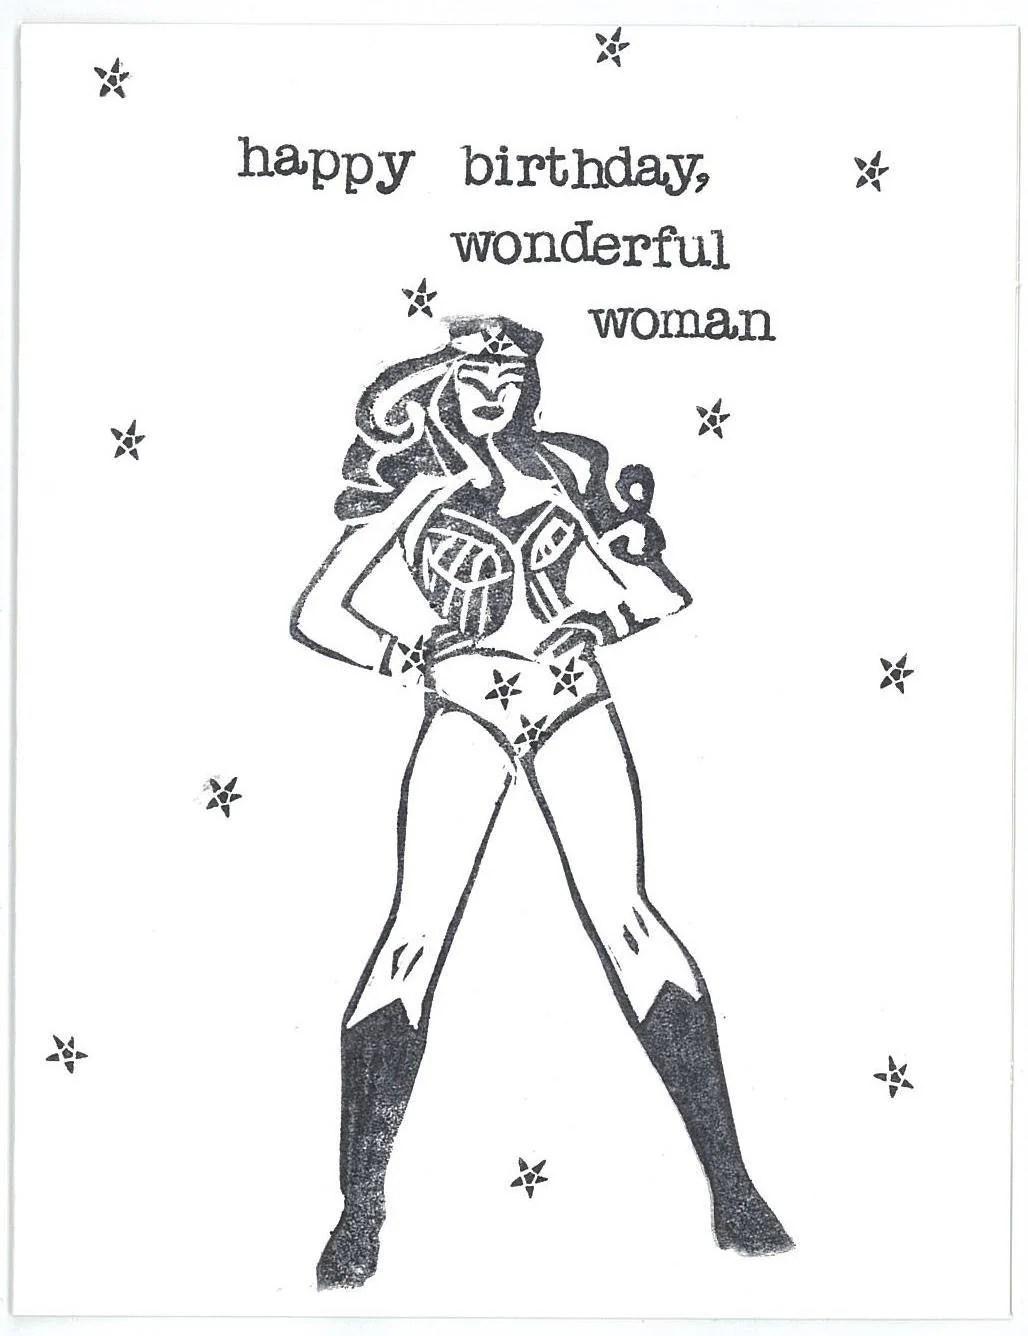 Wonder Woman Happy Birthday Card